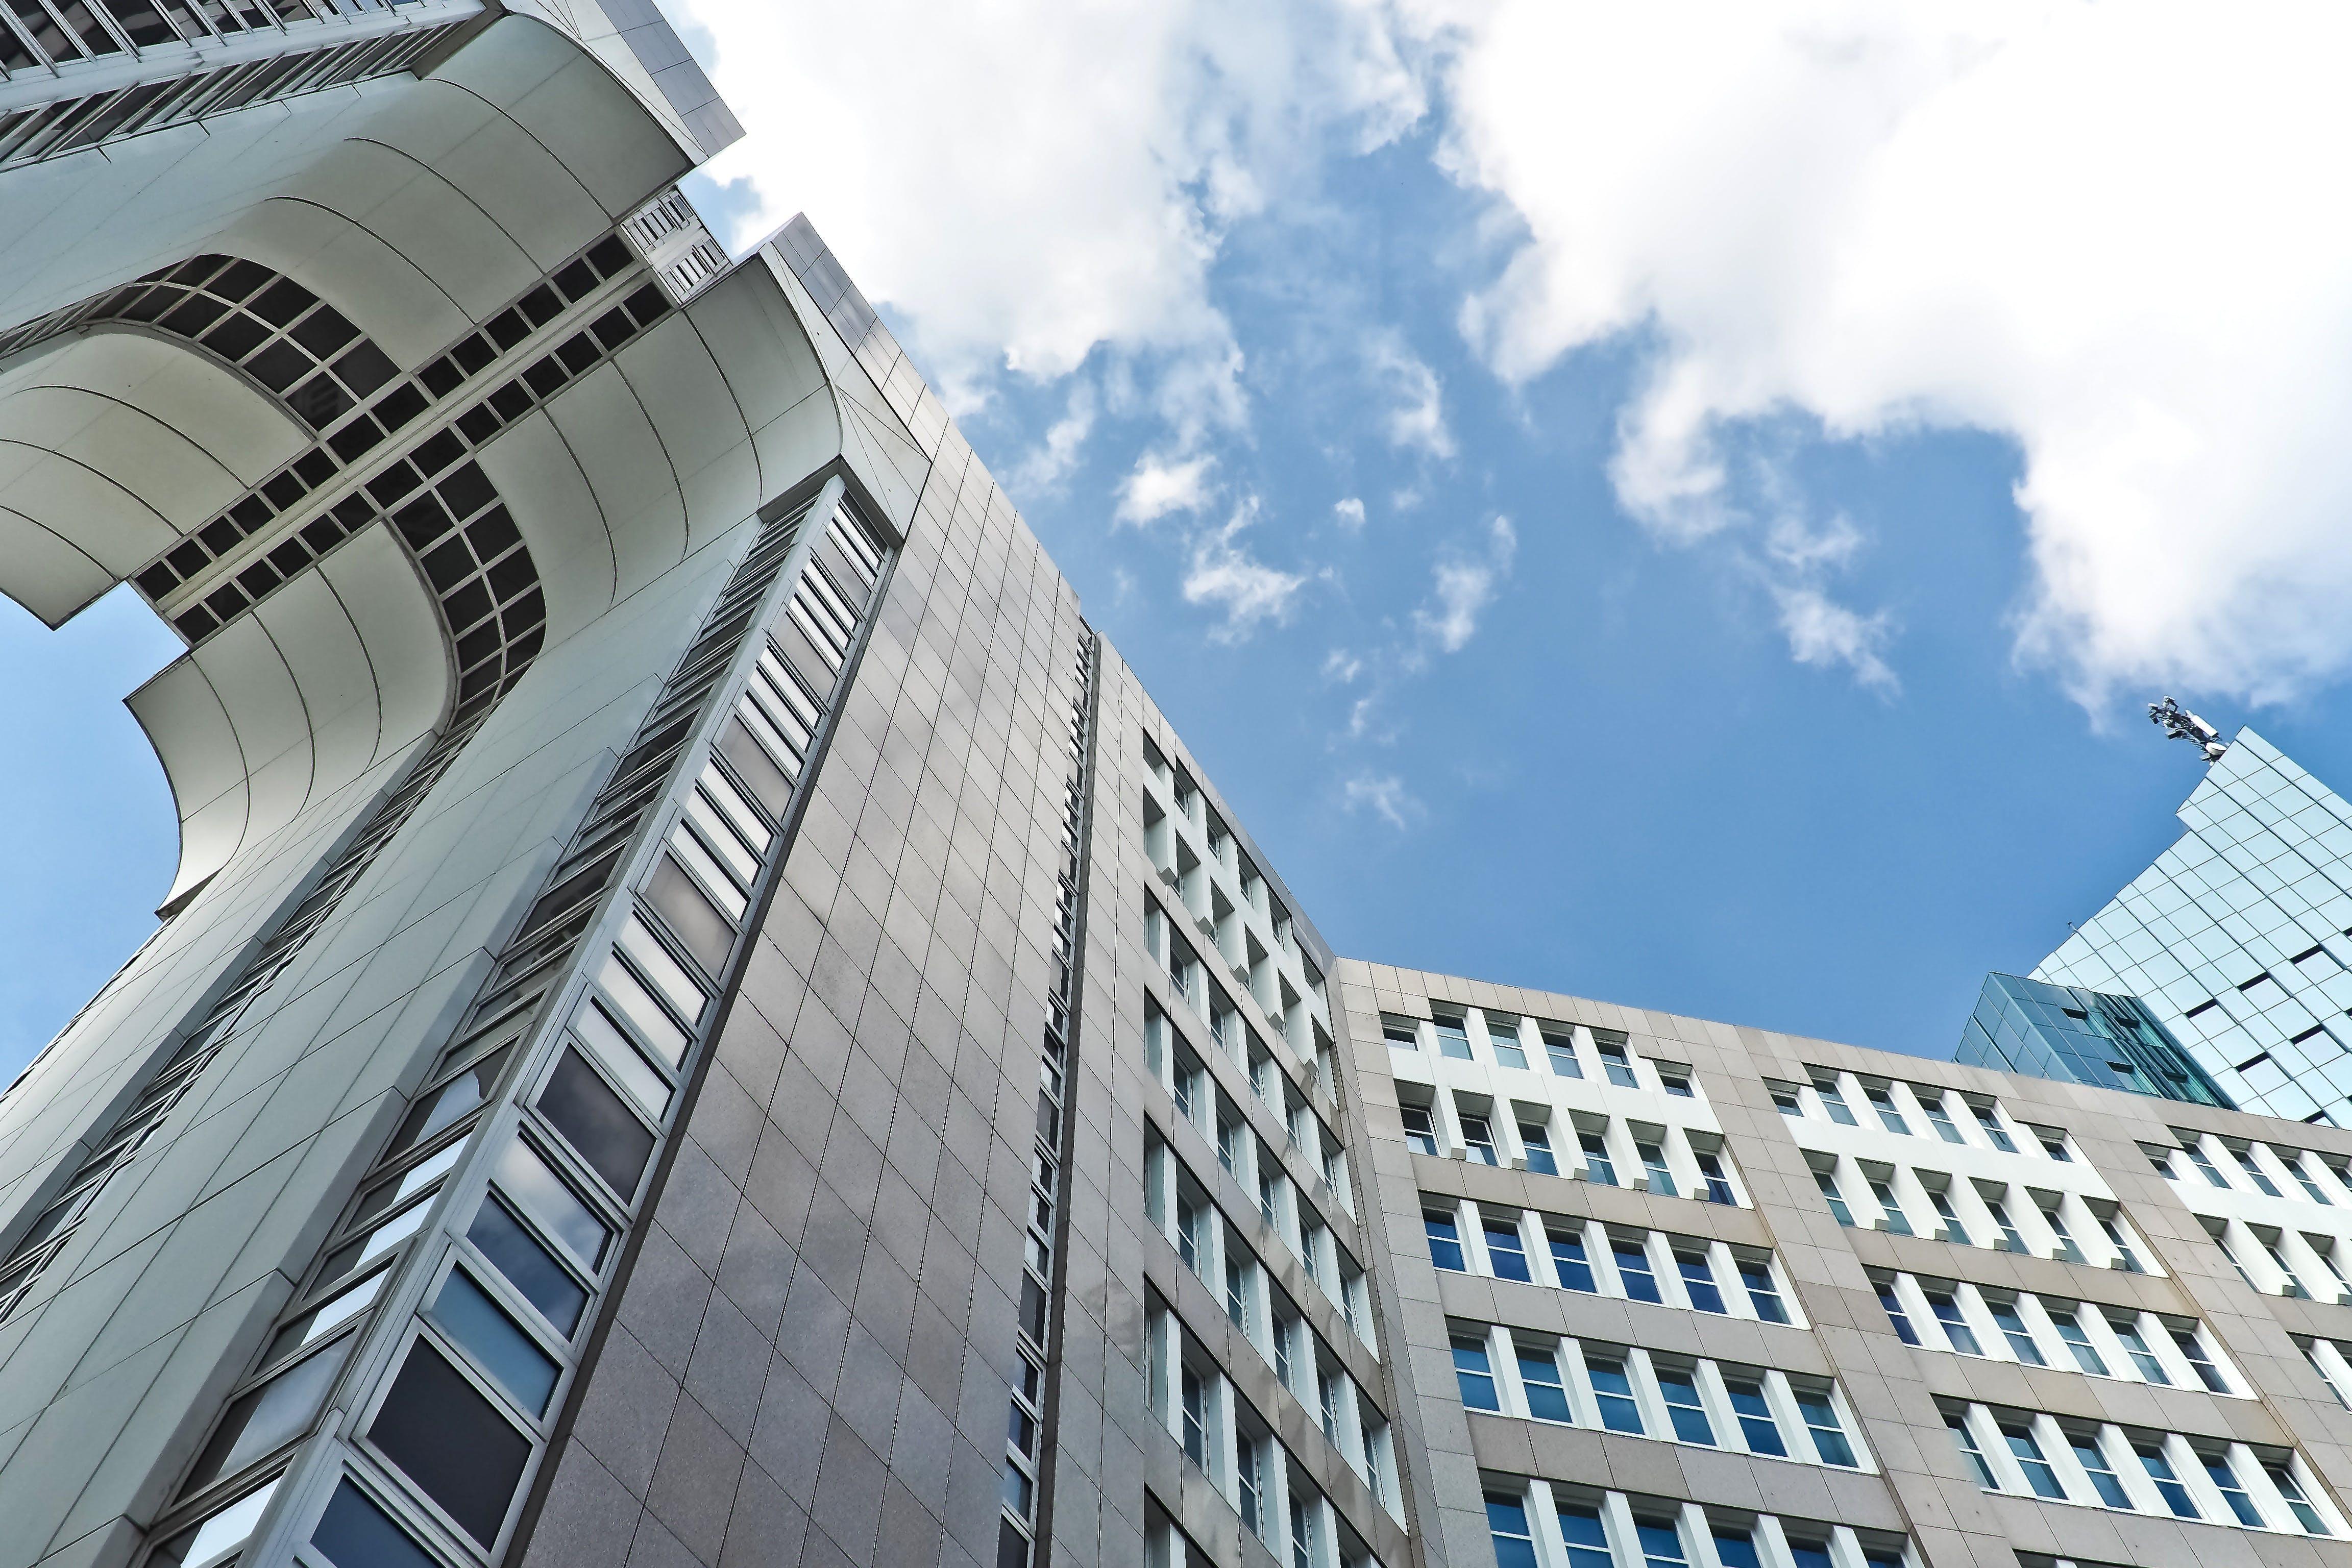 Grey Concrete High Rise Building Under Blue Sky